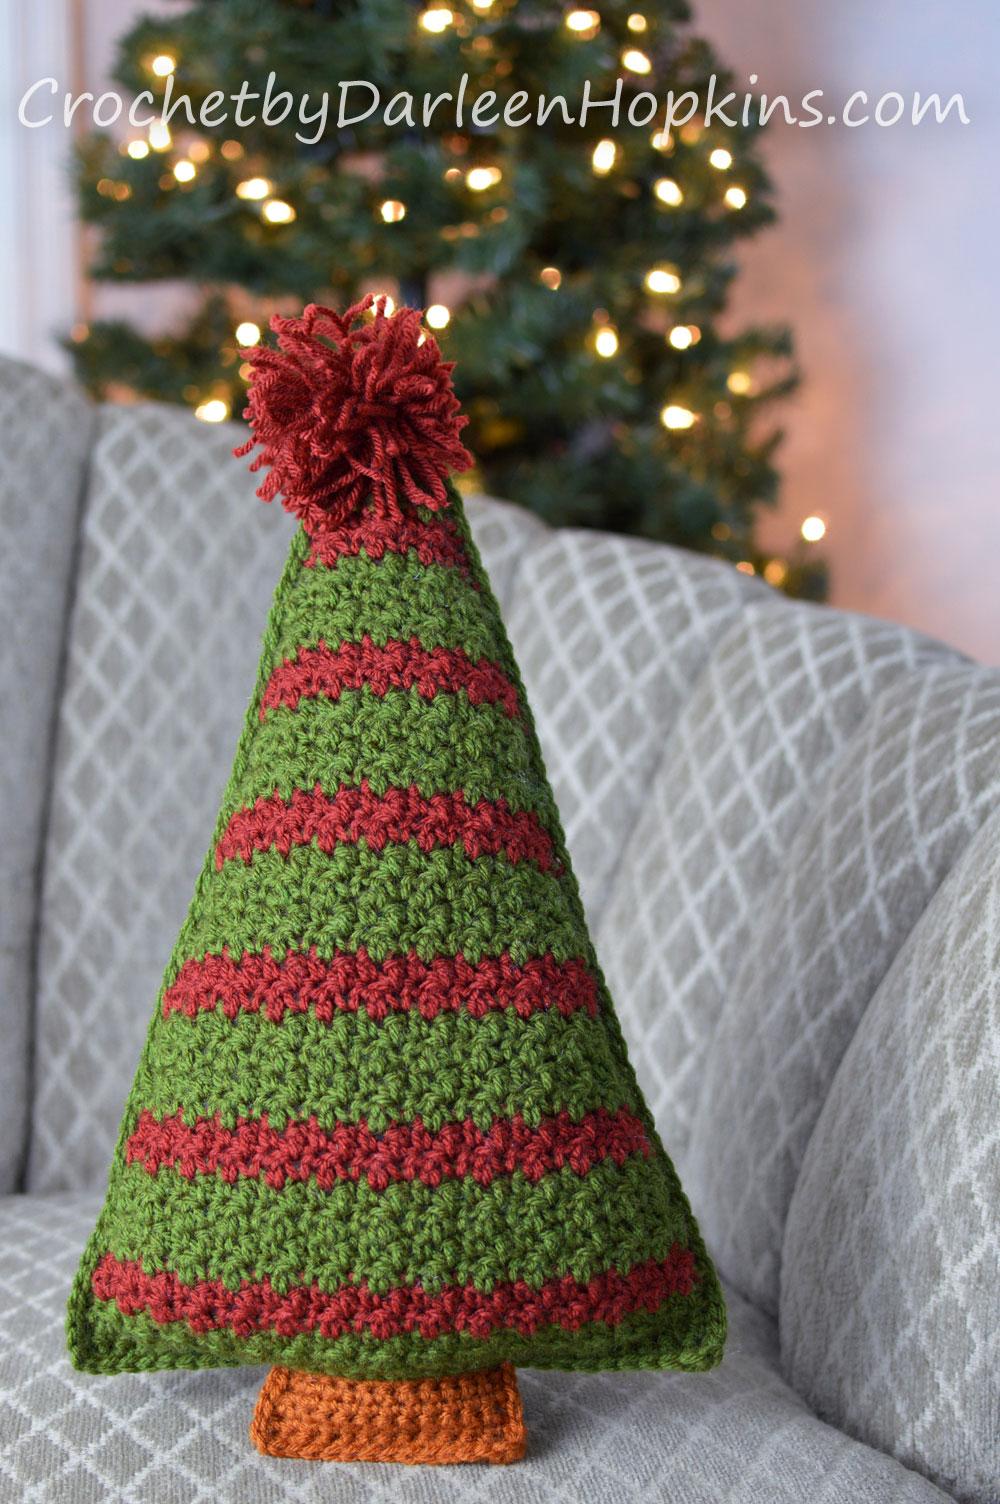 Striped Christmas Tree Pillow crochet pattern by Darleen Hopkins